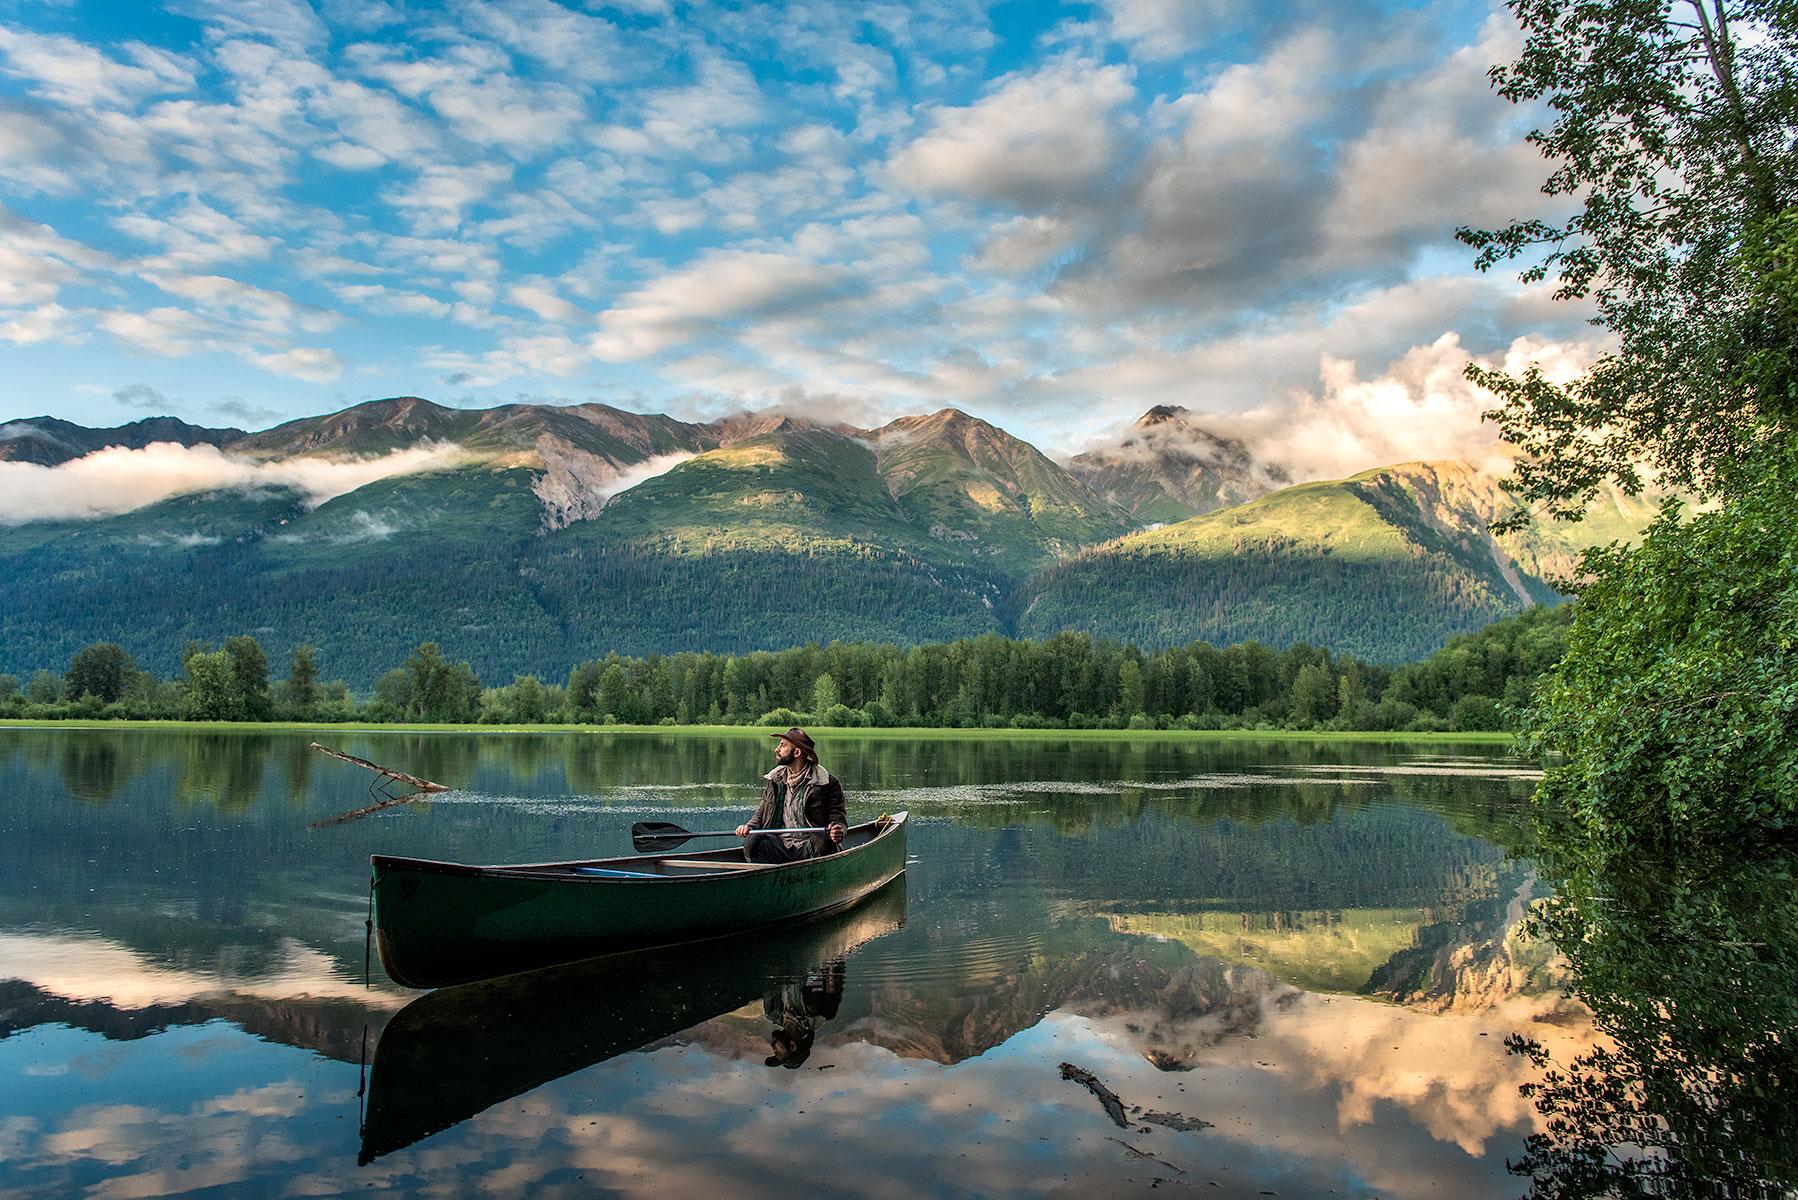 austin-trigg-brave-wilderness-alaska-Coyote-Mosquito-Lake-Canoe-Sunset.jpg